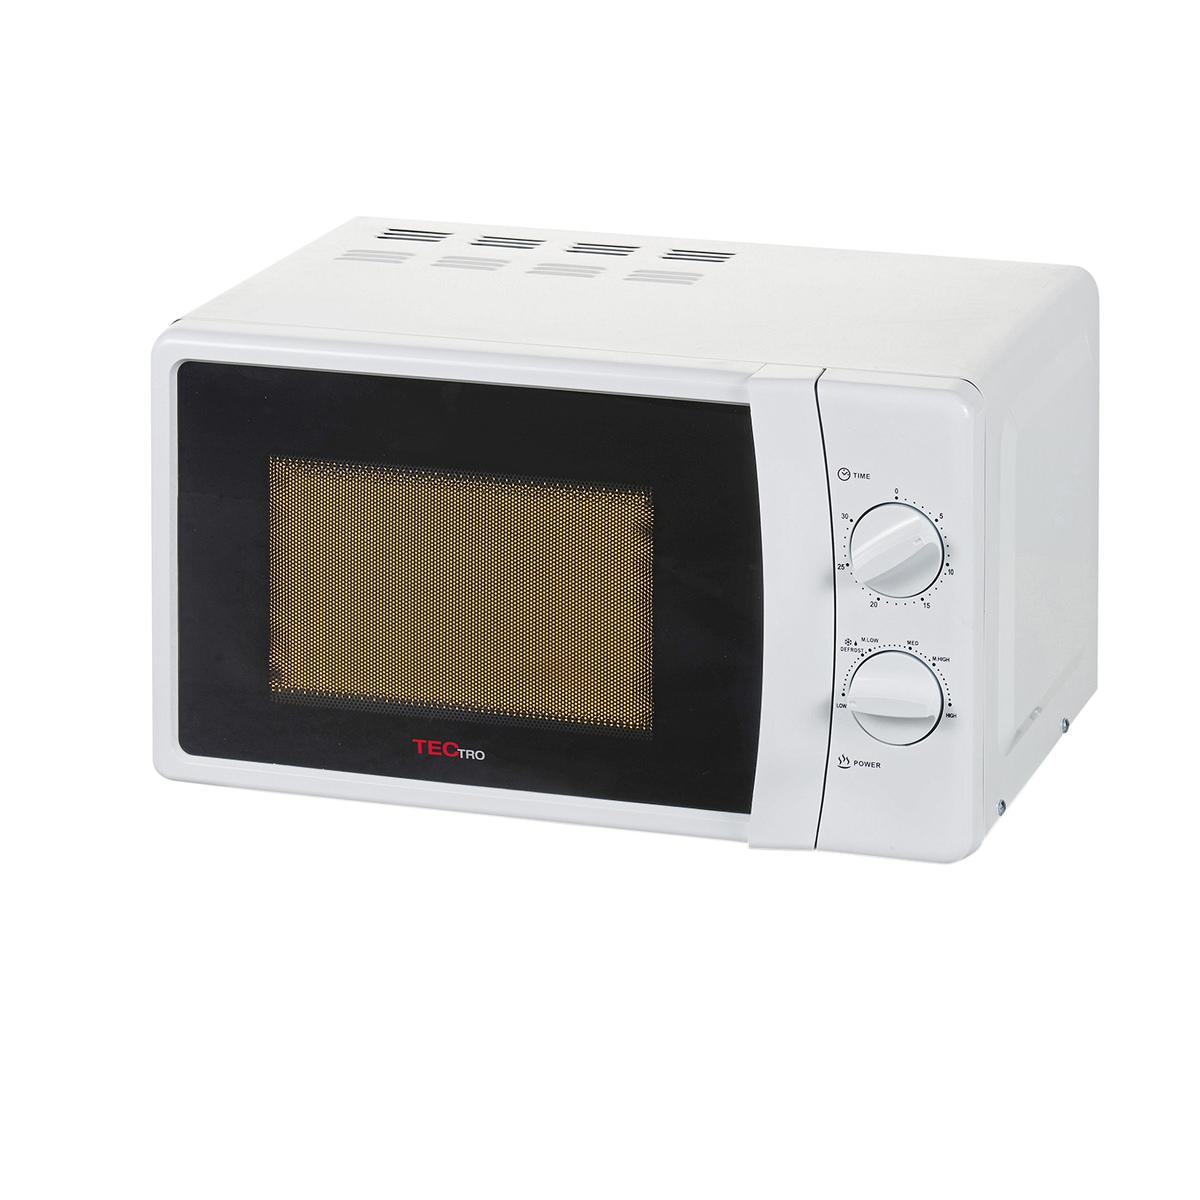 tectro mikrowelle mw 161 700 watt jetzt im kodi onlineshop kaufen alles f r den haushalt kodi. Black Bedroom Furniture Sets. Home Design Ideas